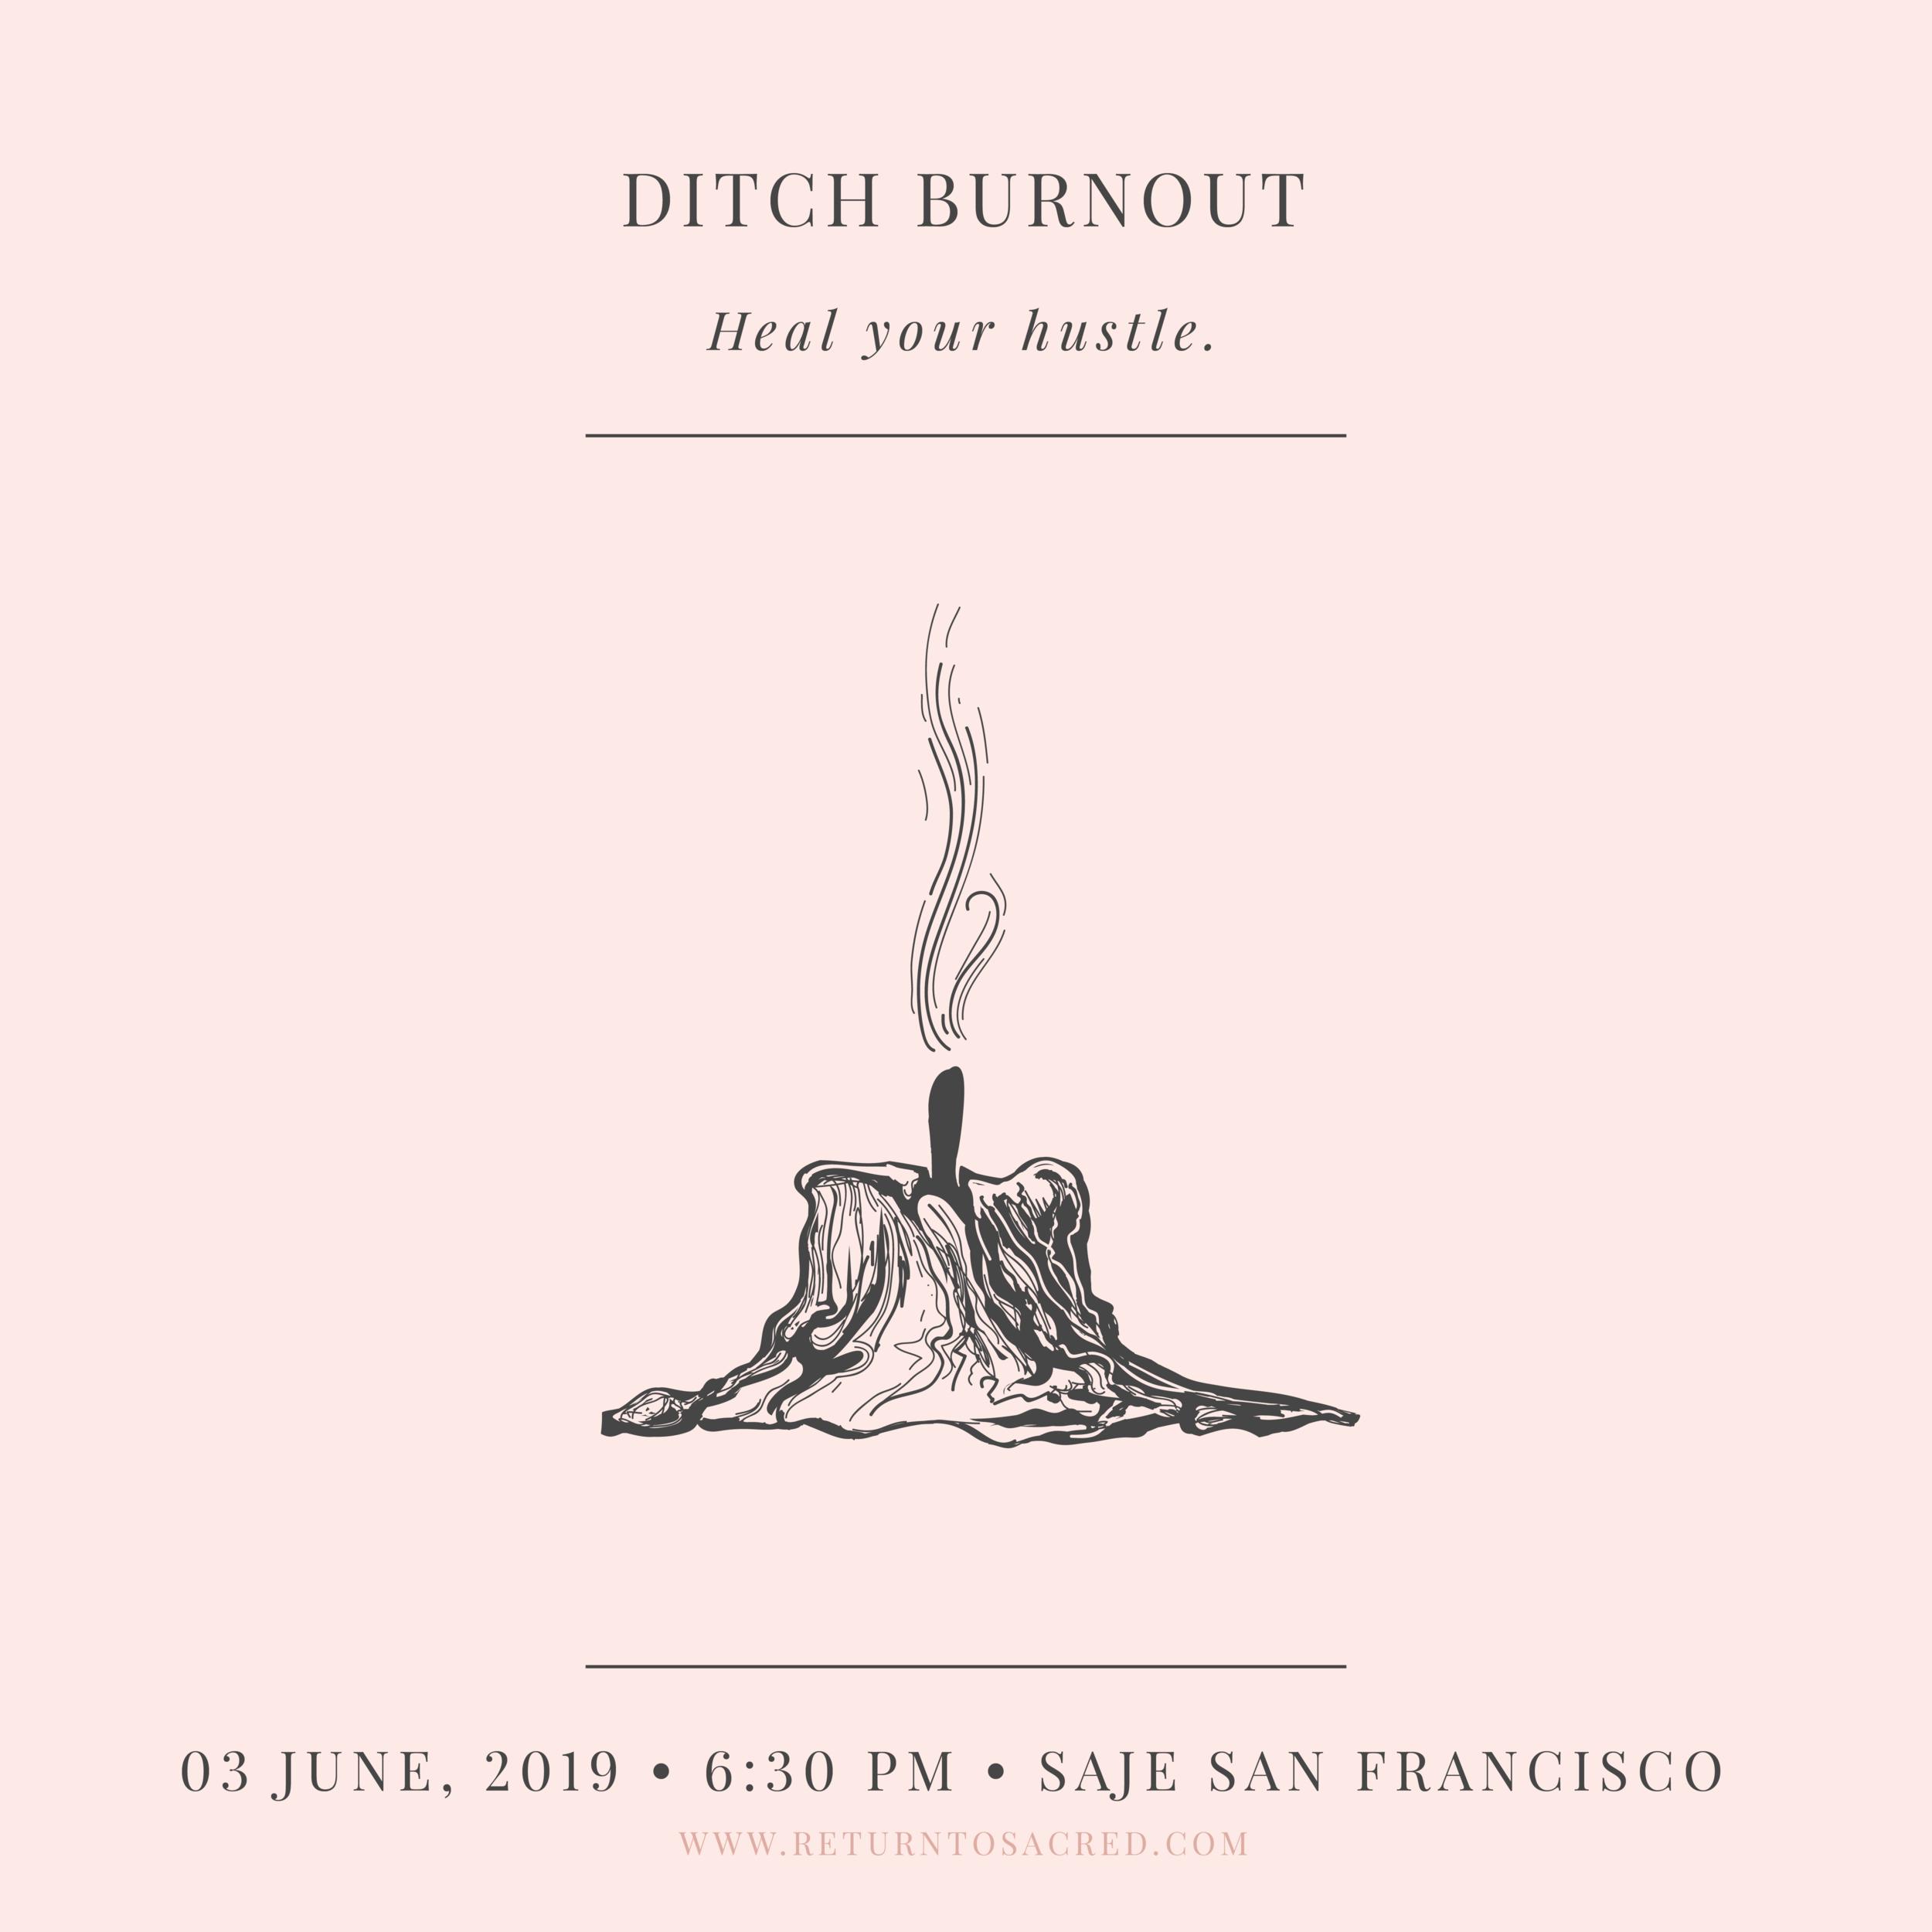 Ditch-Burnout-Square-Saje-June.png